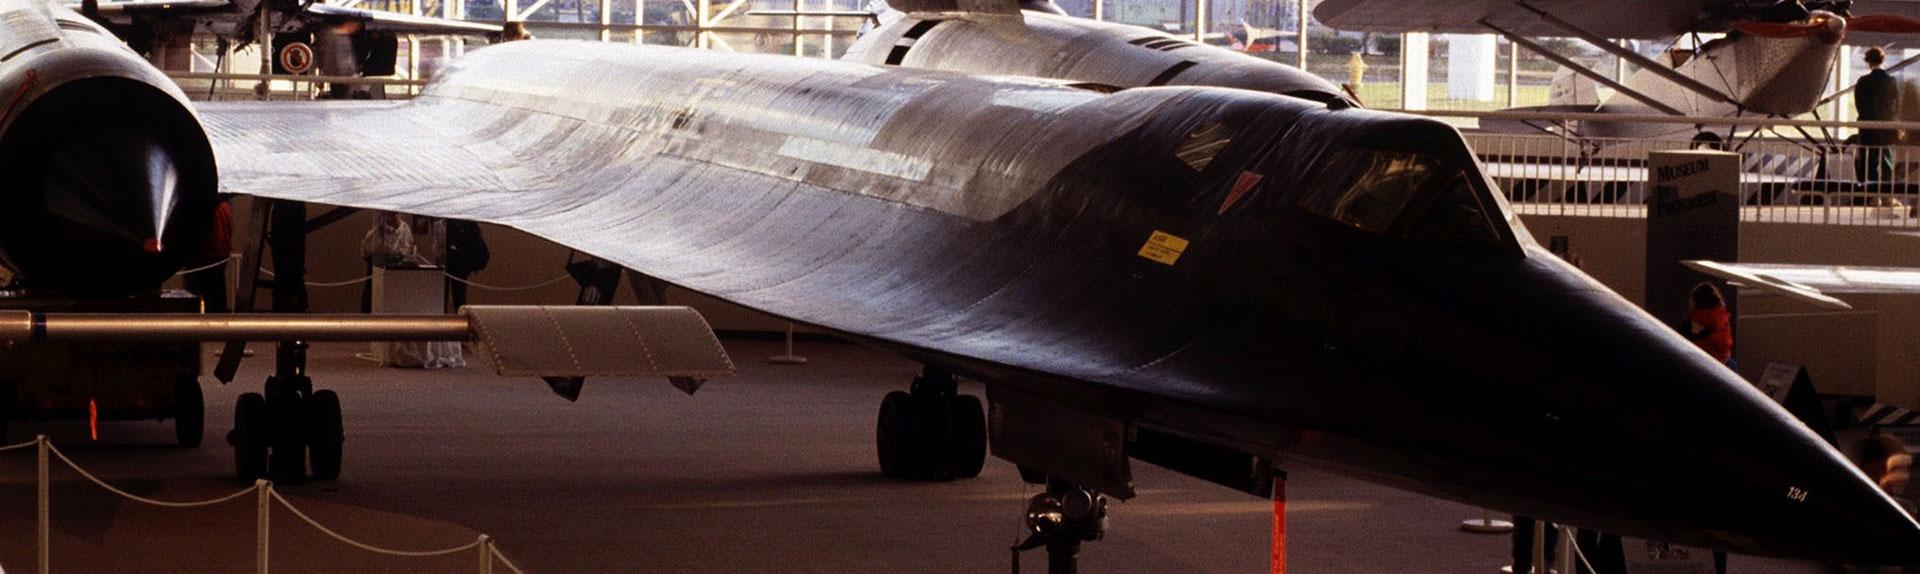 National Air & Space Museum at Melrose Georgetown, Washington